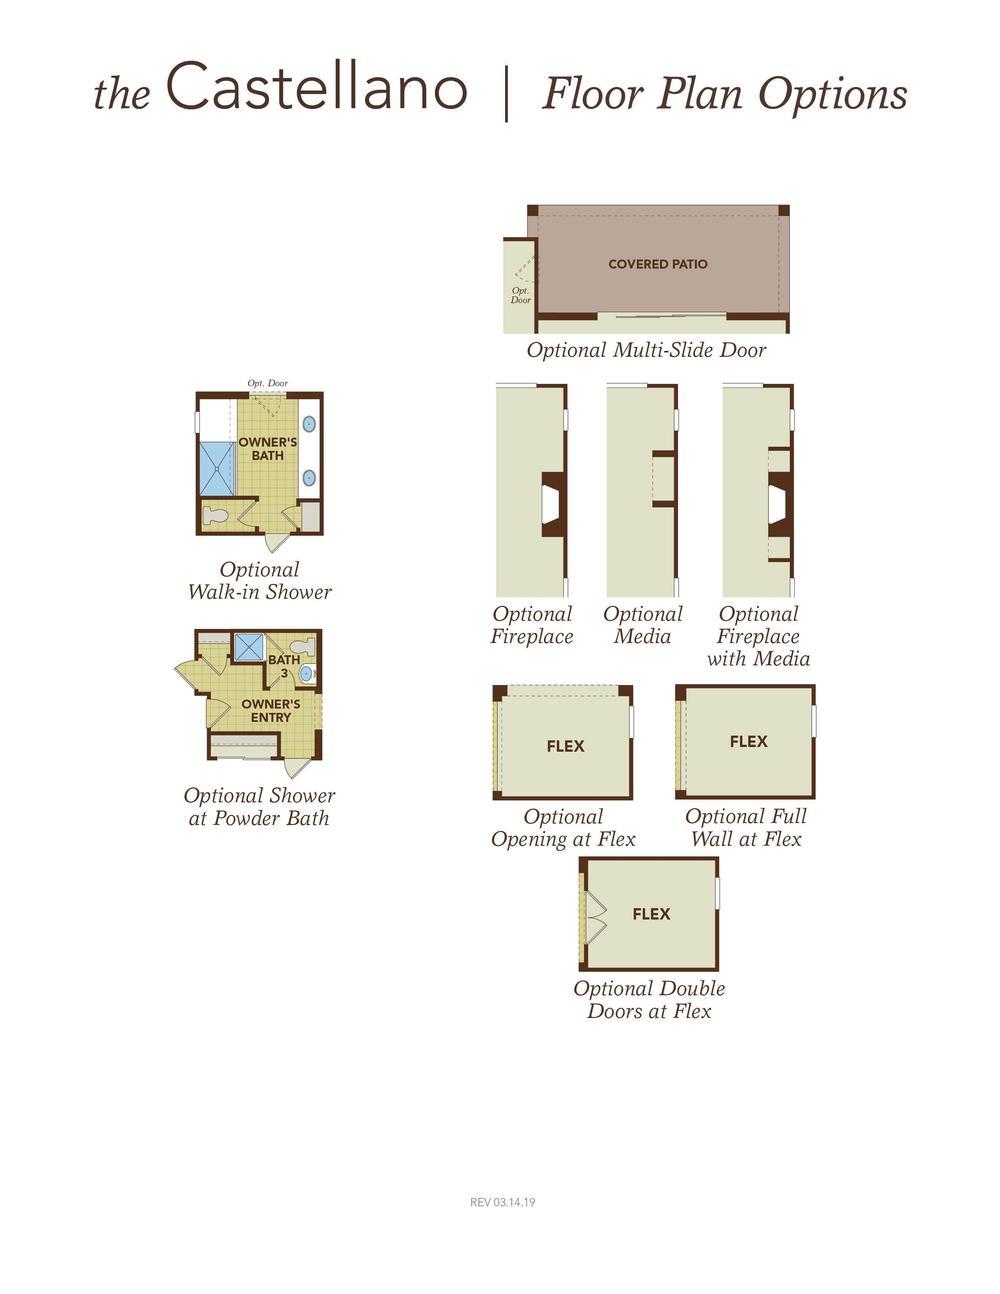 Castellano Floor Plan Options